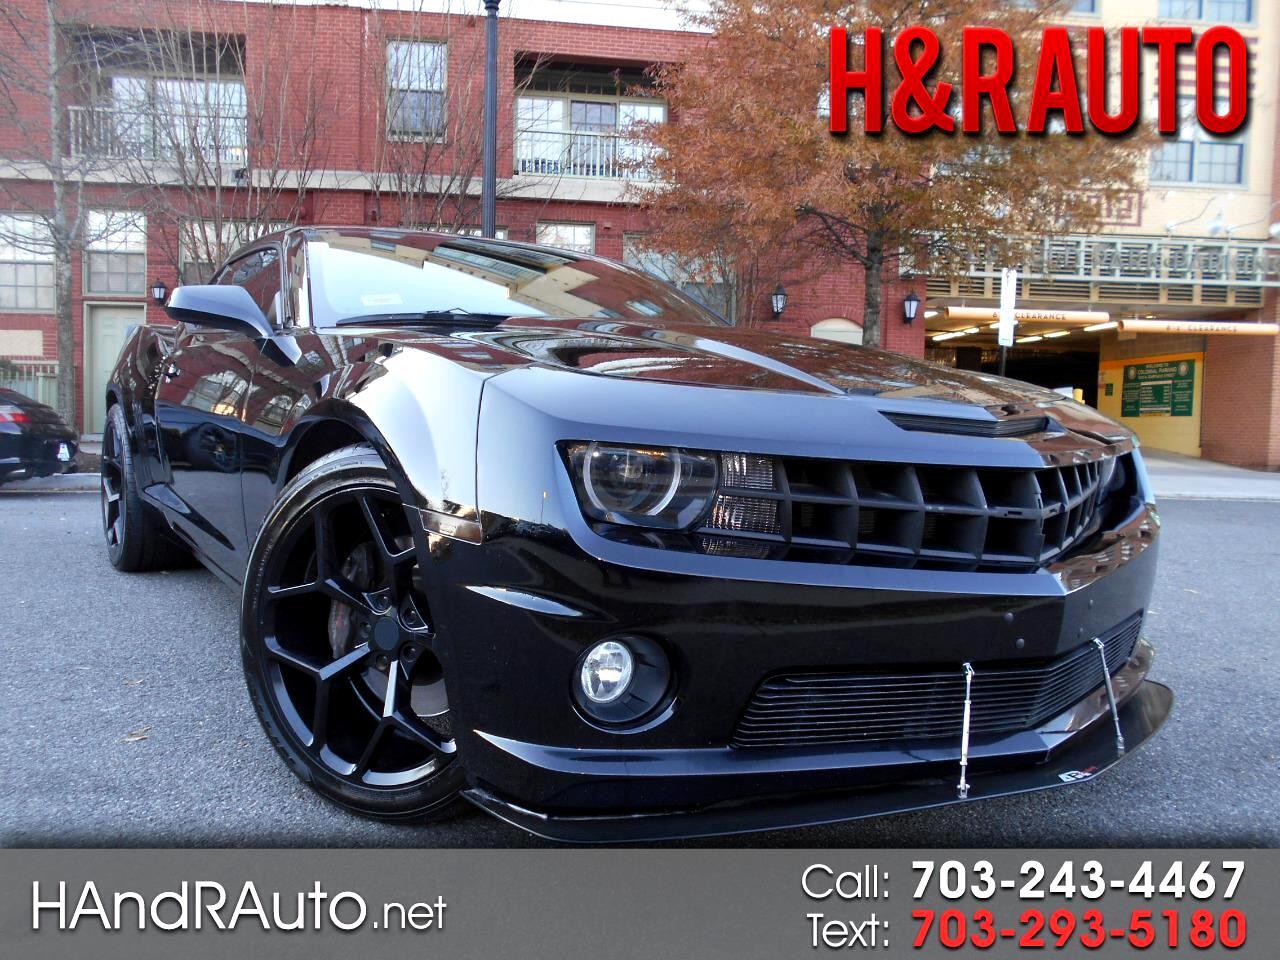 2013 Chevrolet Camaro 2dr Cpe SS w/2SS